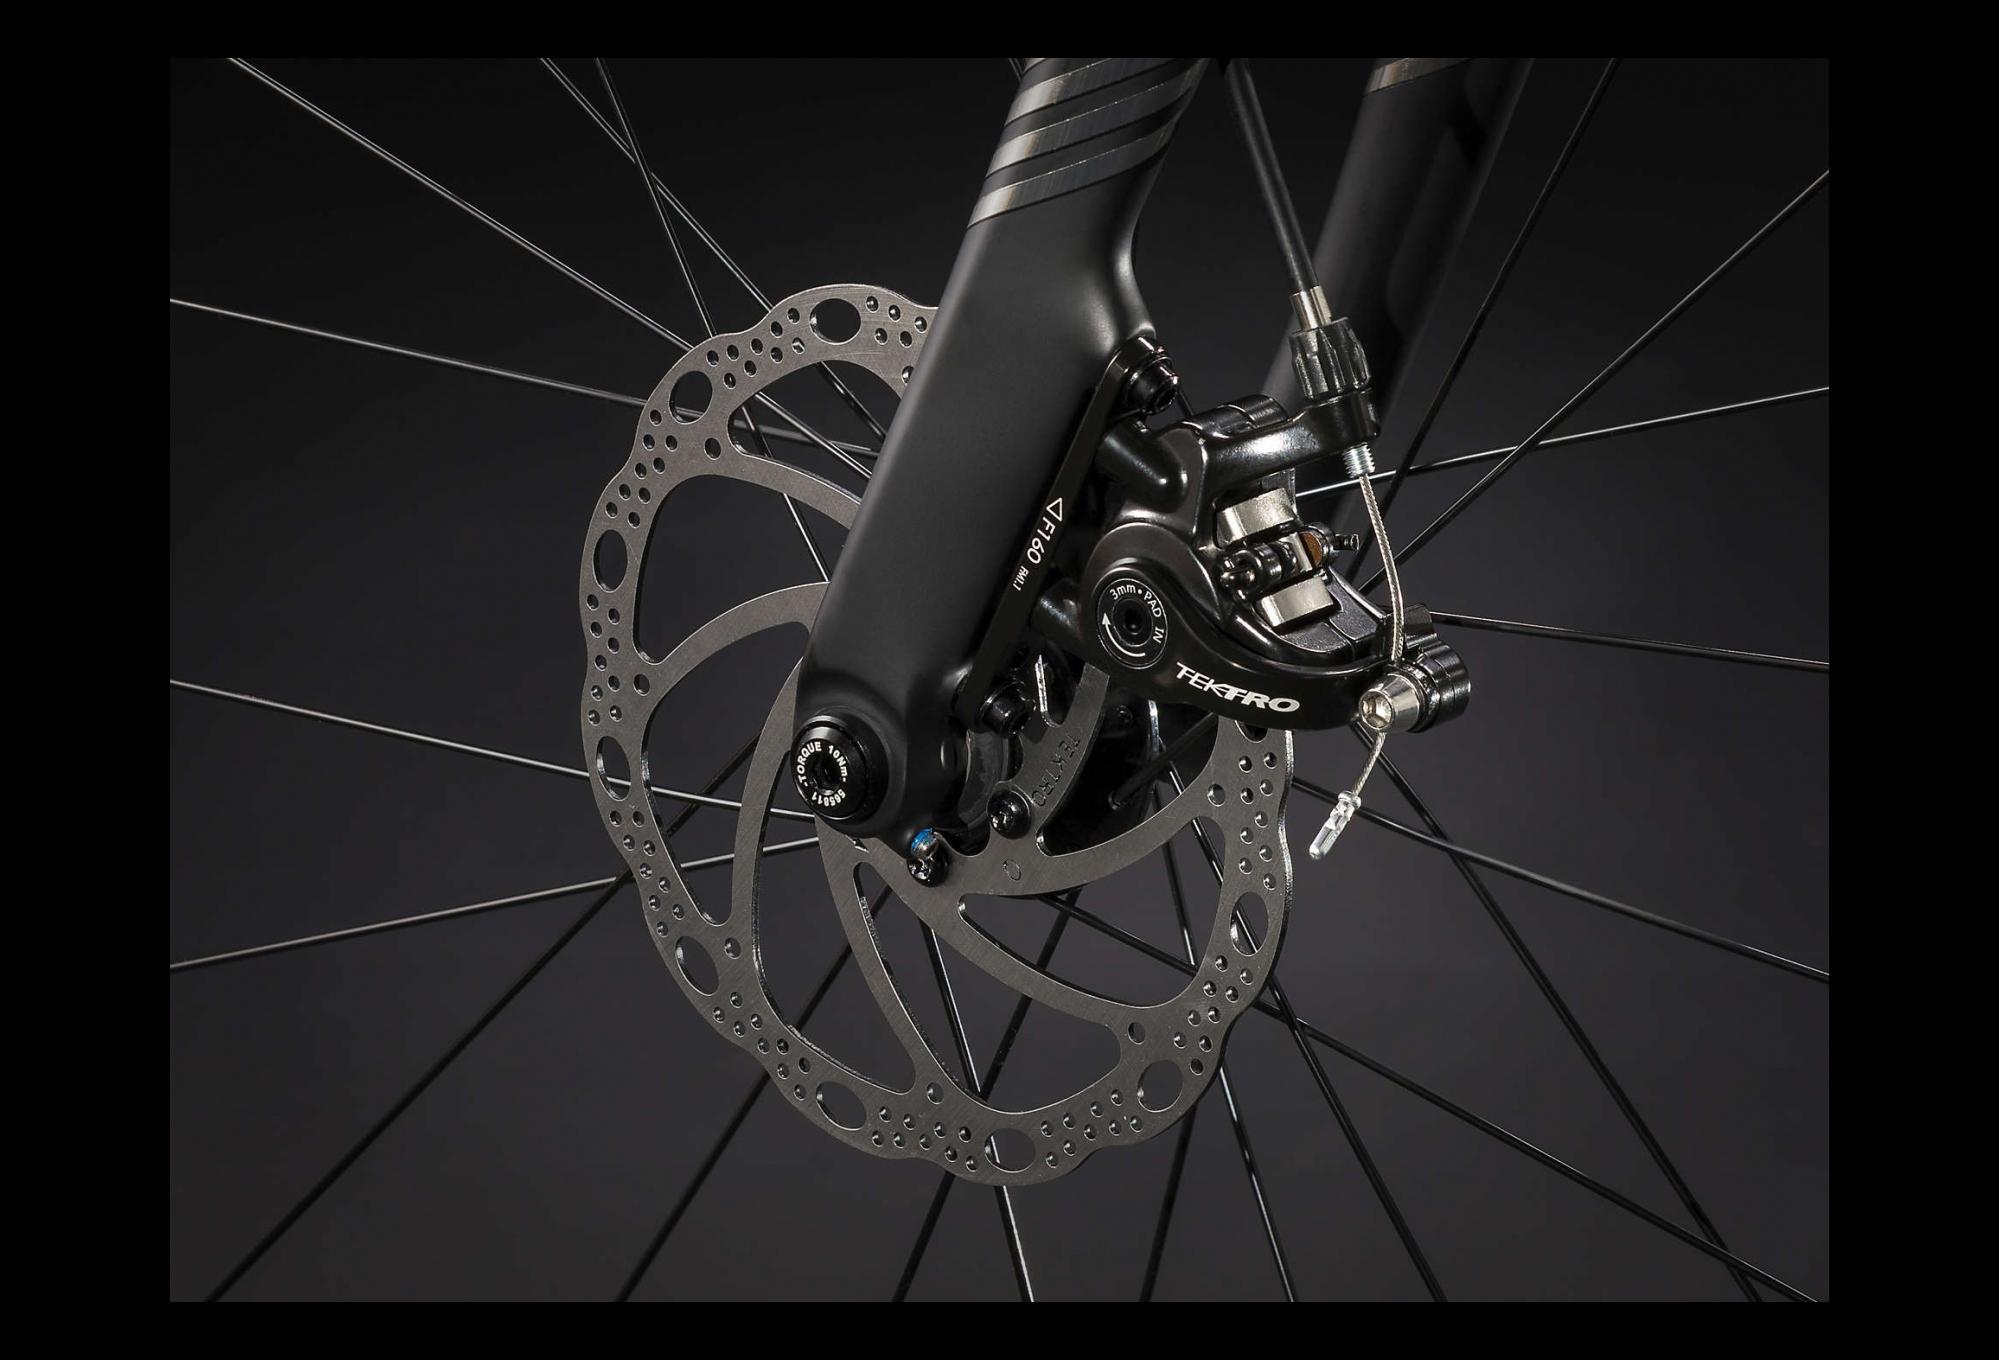 Trek Crockett 4 Disc Cyclocross Bike Sram Apex 11S 2020 Matte Trek Black